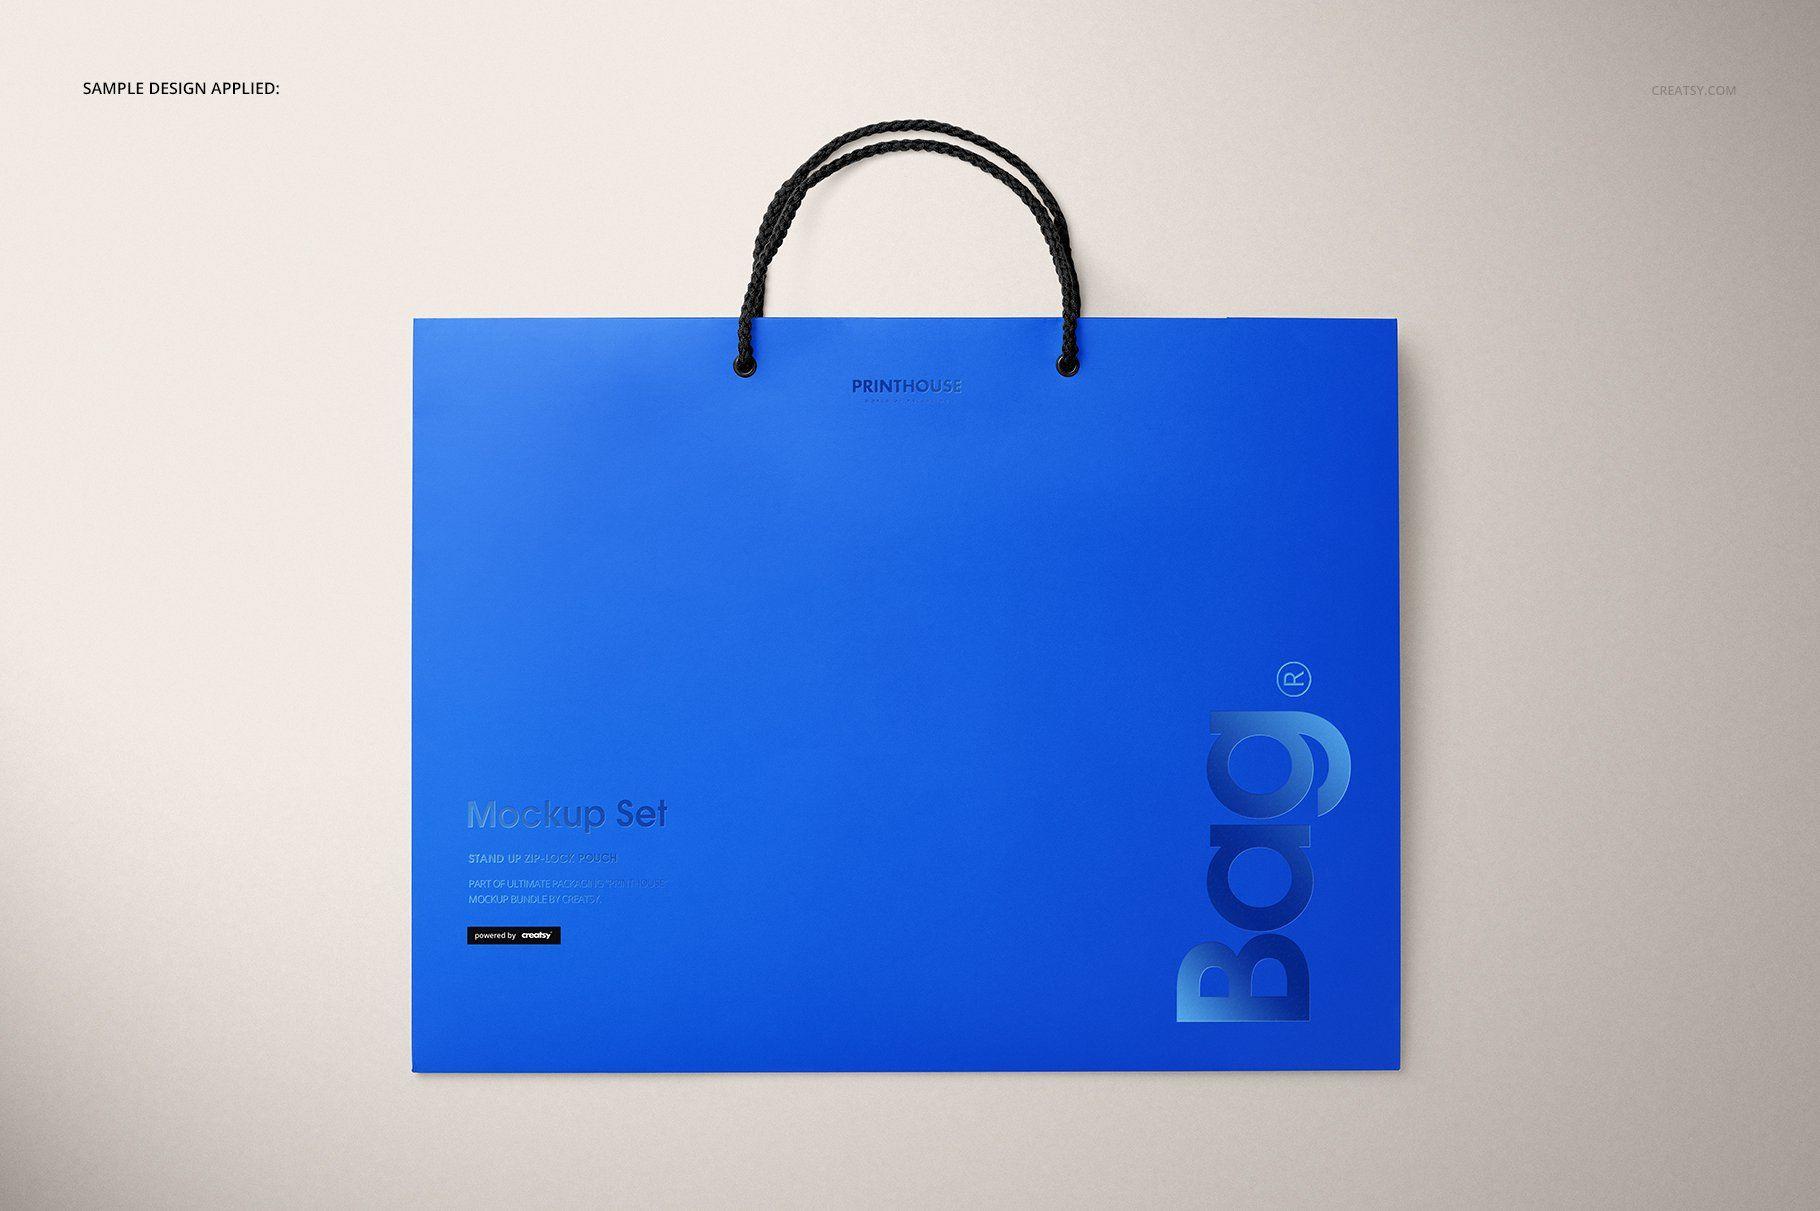 Download Eurotote Bag 2 Mockup Set Business Powerpoint Templates Mockup Creative Market